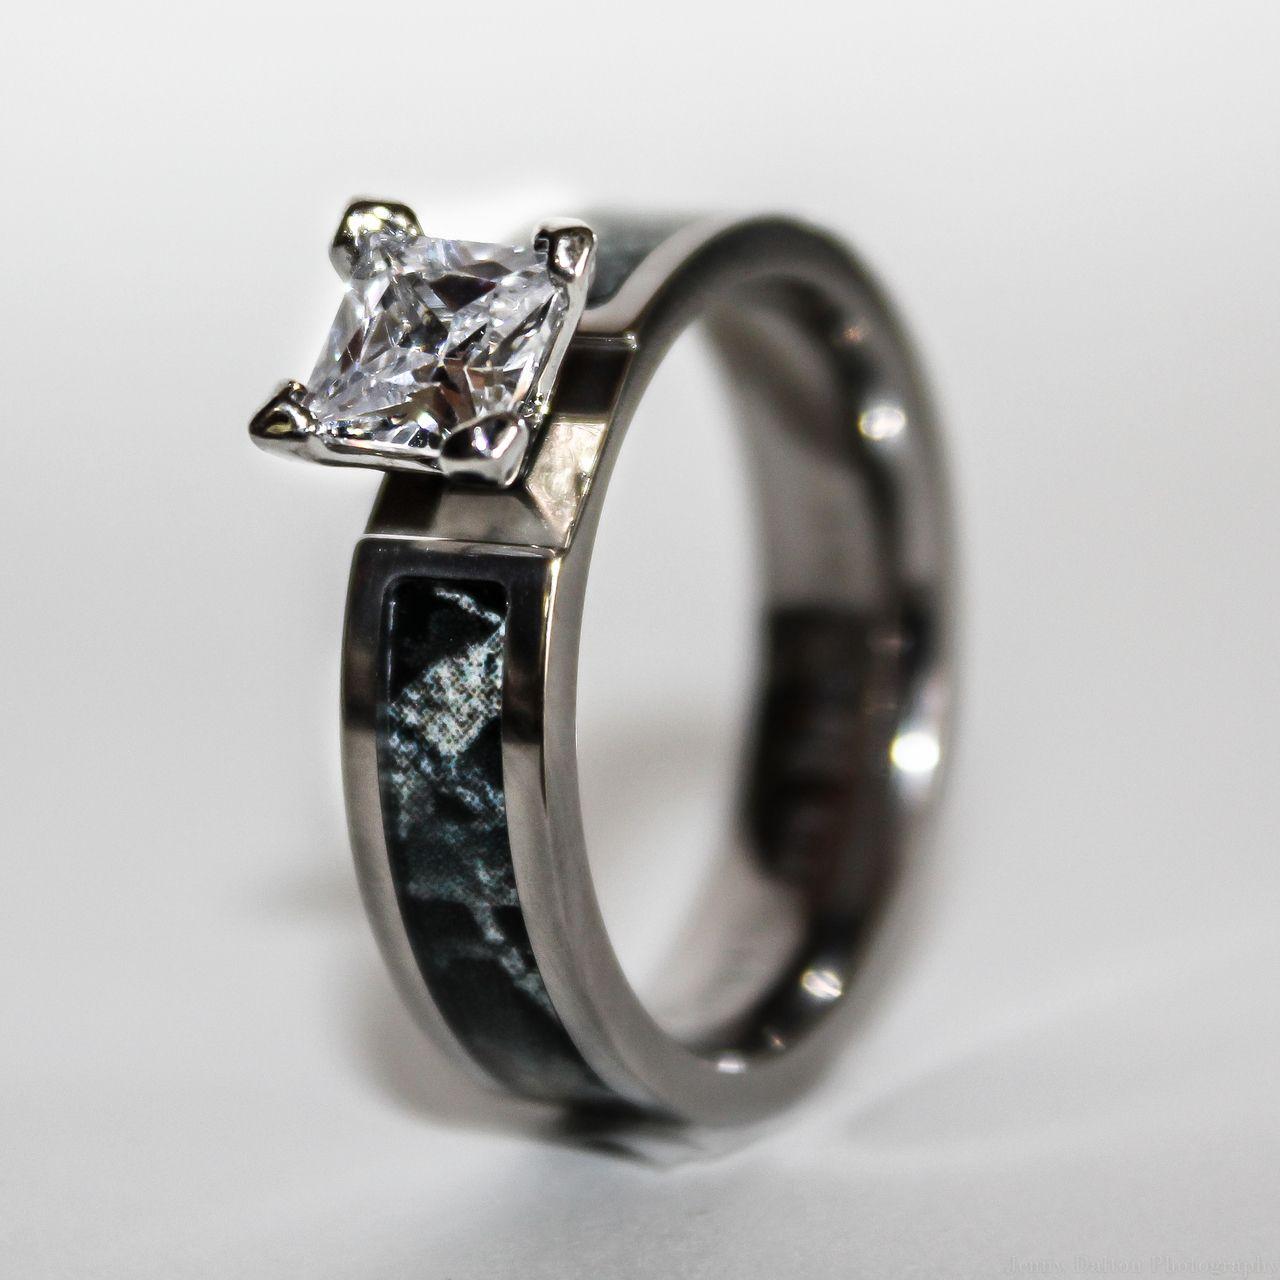 pink camo wedding rings Black Camo Wedding Engagement Ring Titanium with CZ Stone